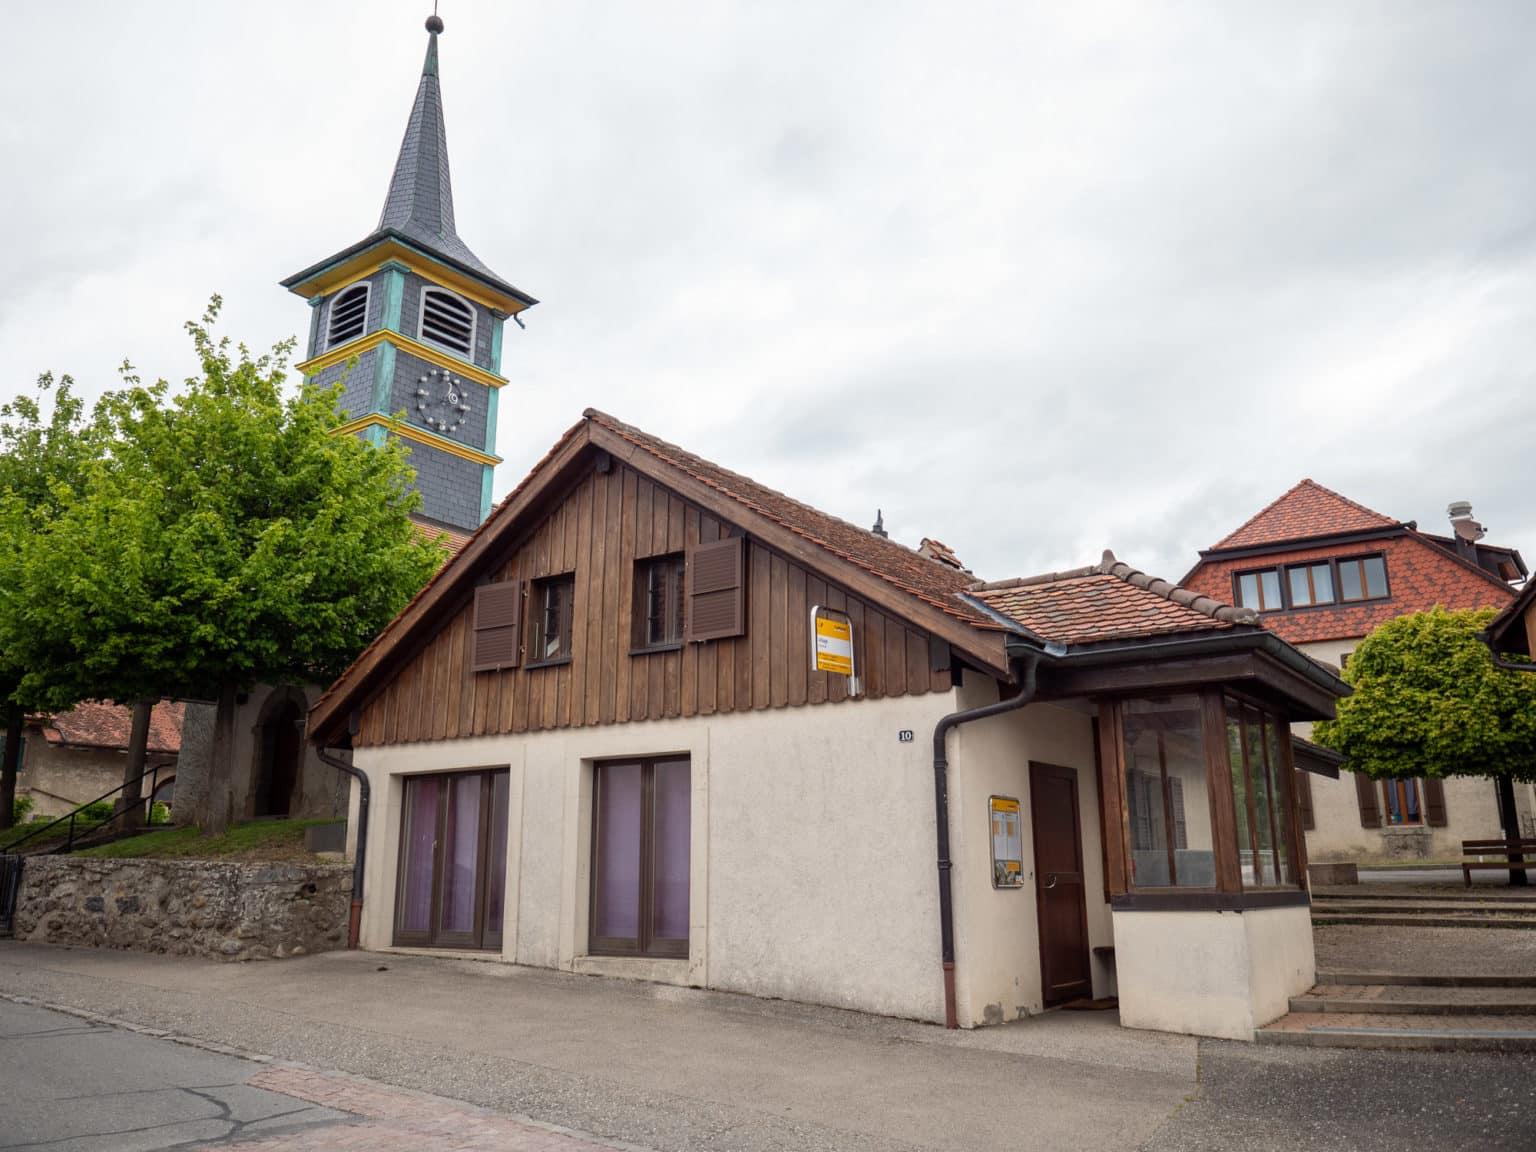 Refuges-salles-Montanaire_MAINIMAGE-©V-Dubach-52666